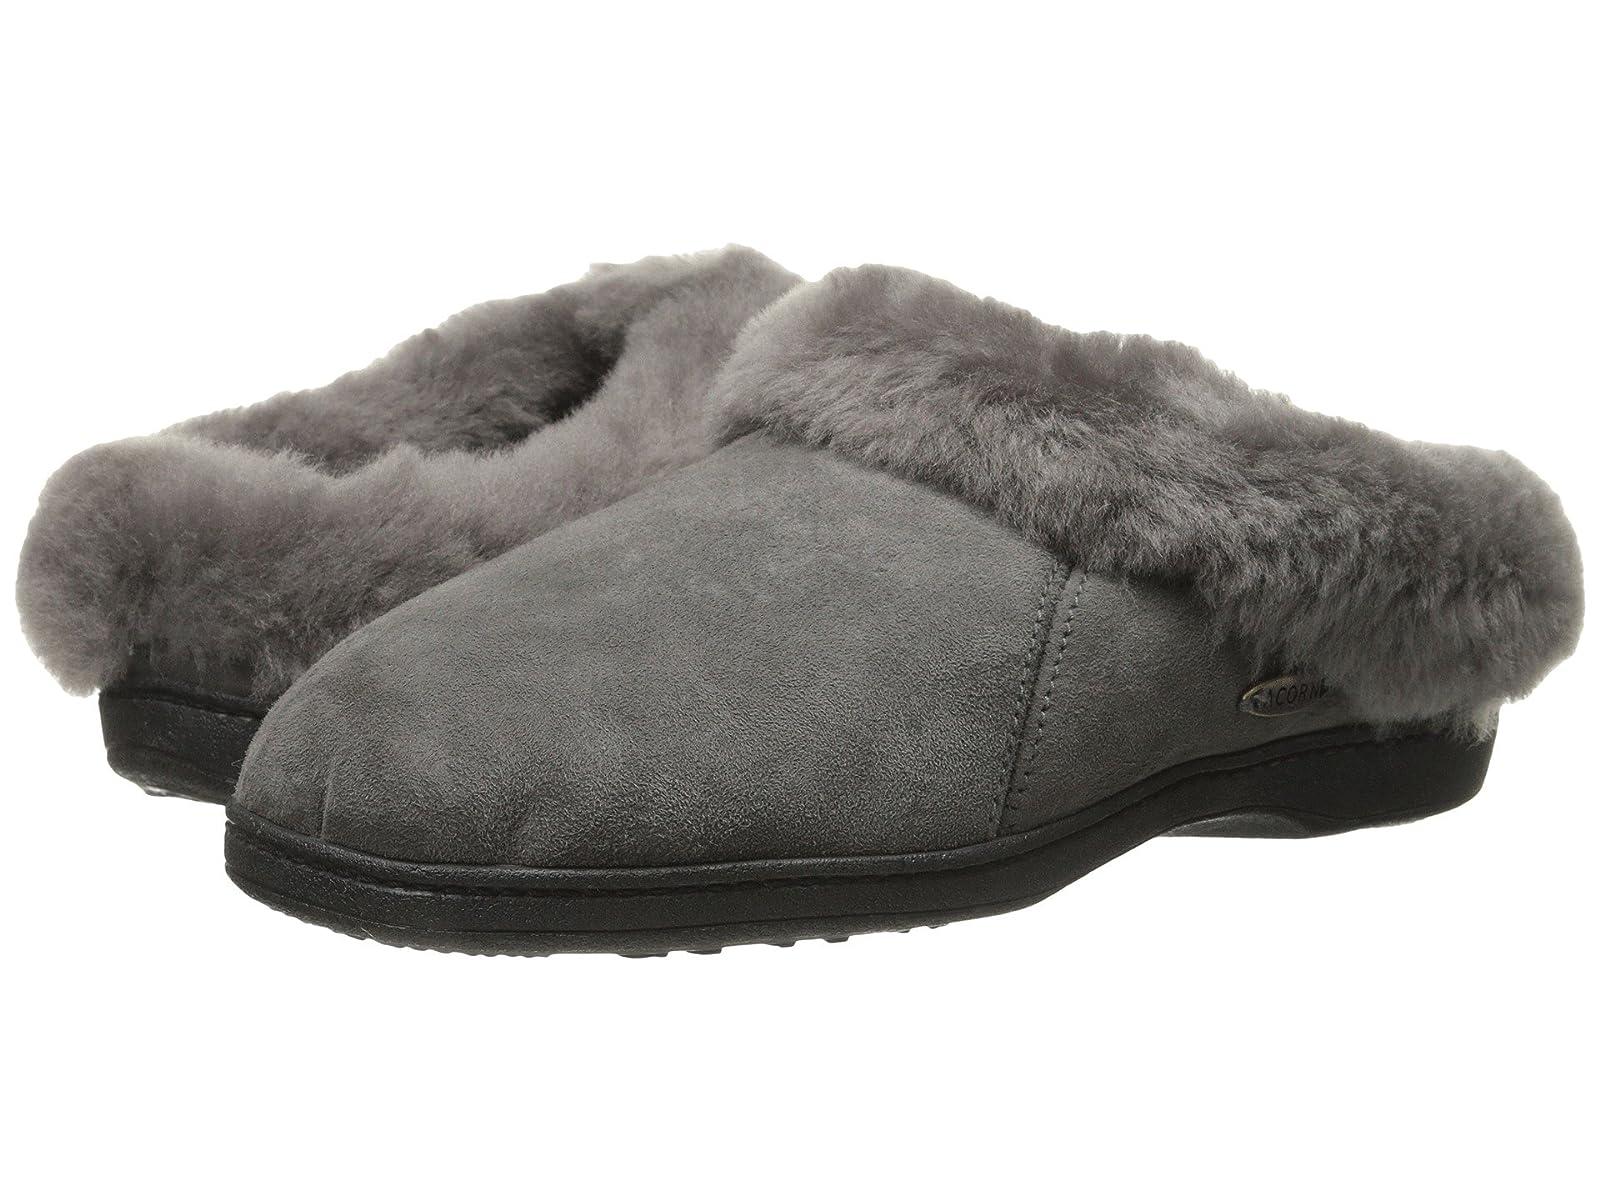 Acorn Ewe CollarAtmospheric grades have affordable shoes